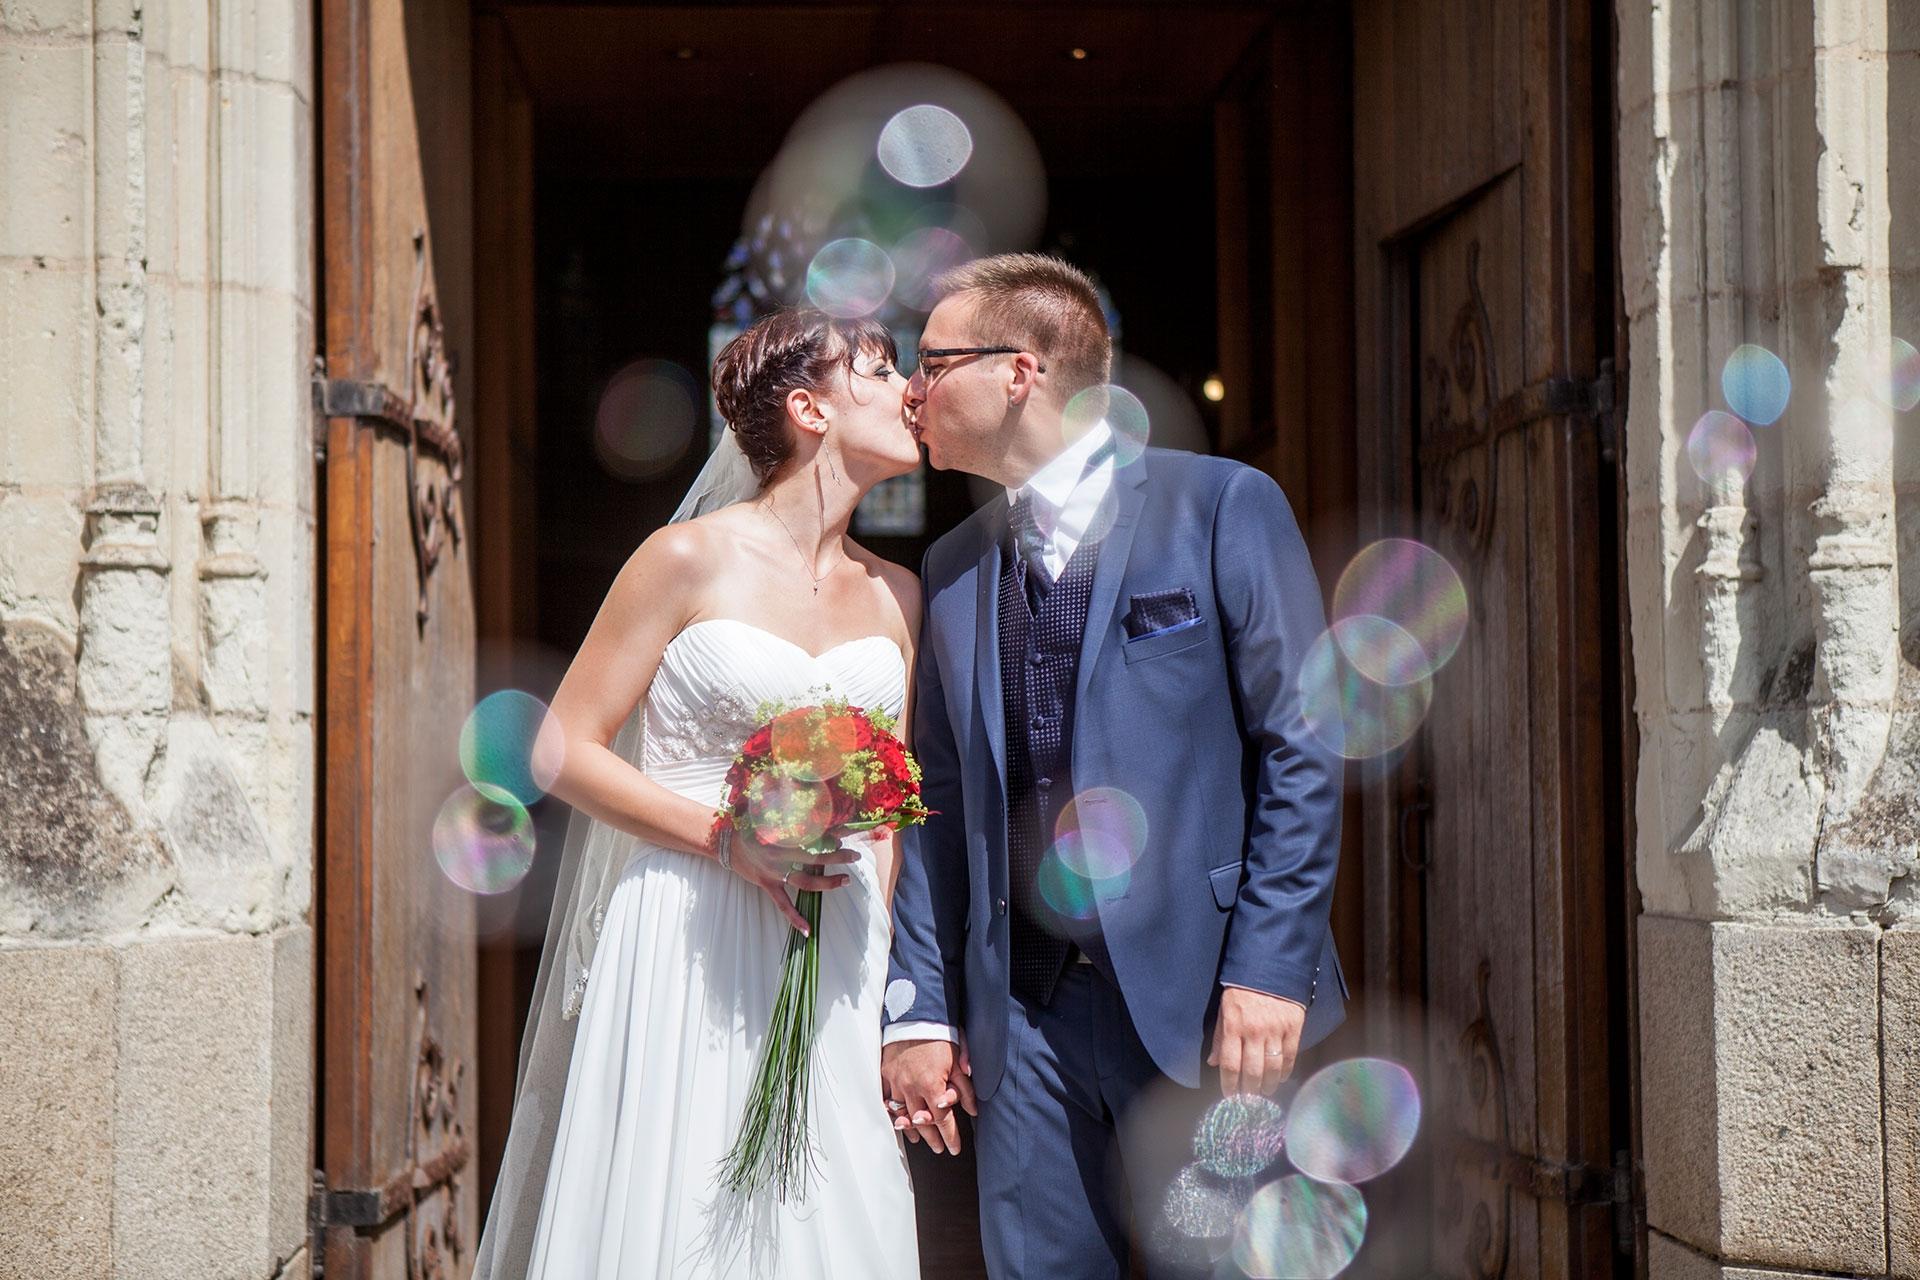 particuliers-evenements-mariages-oui-aurelie&geoffrey-24